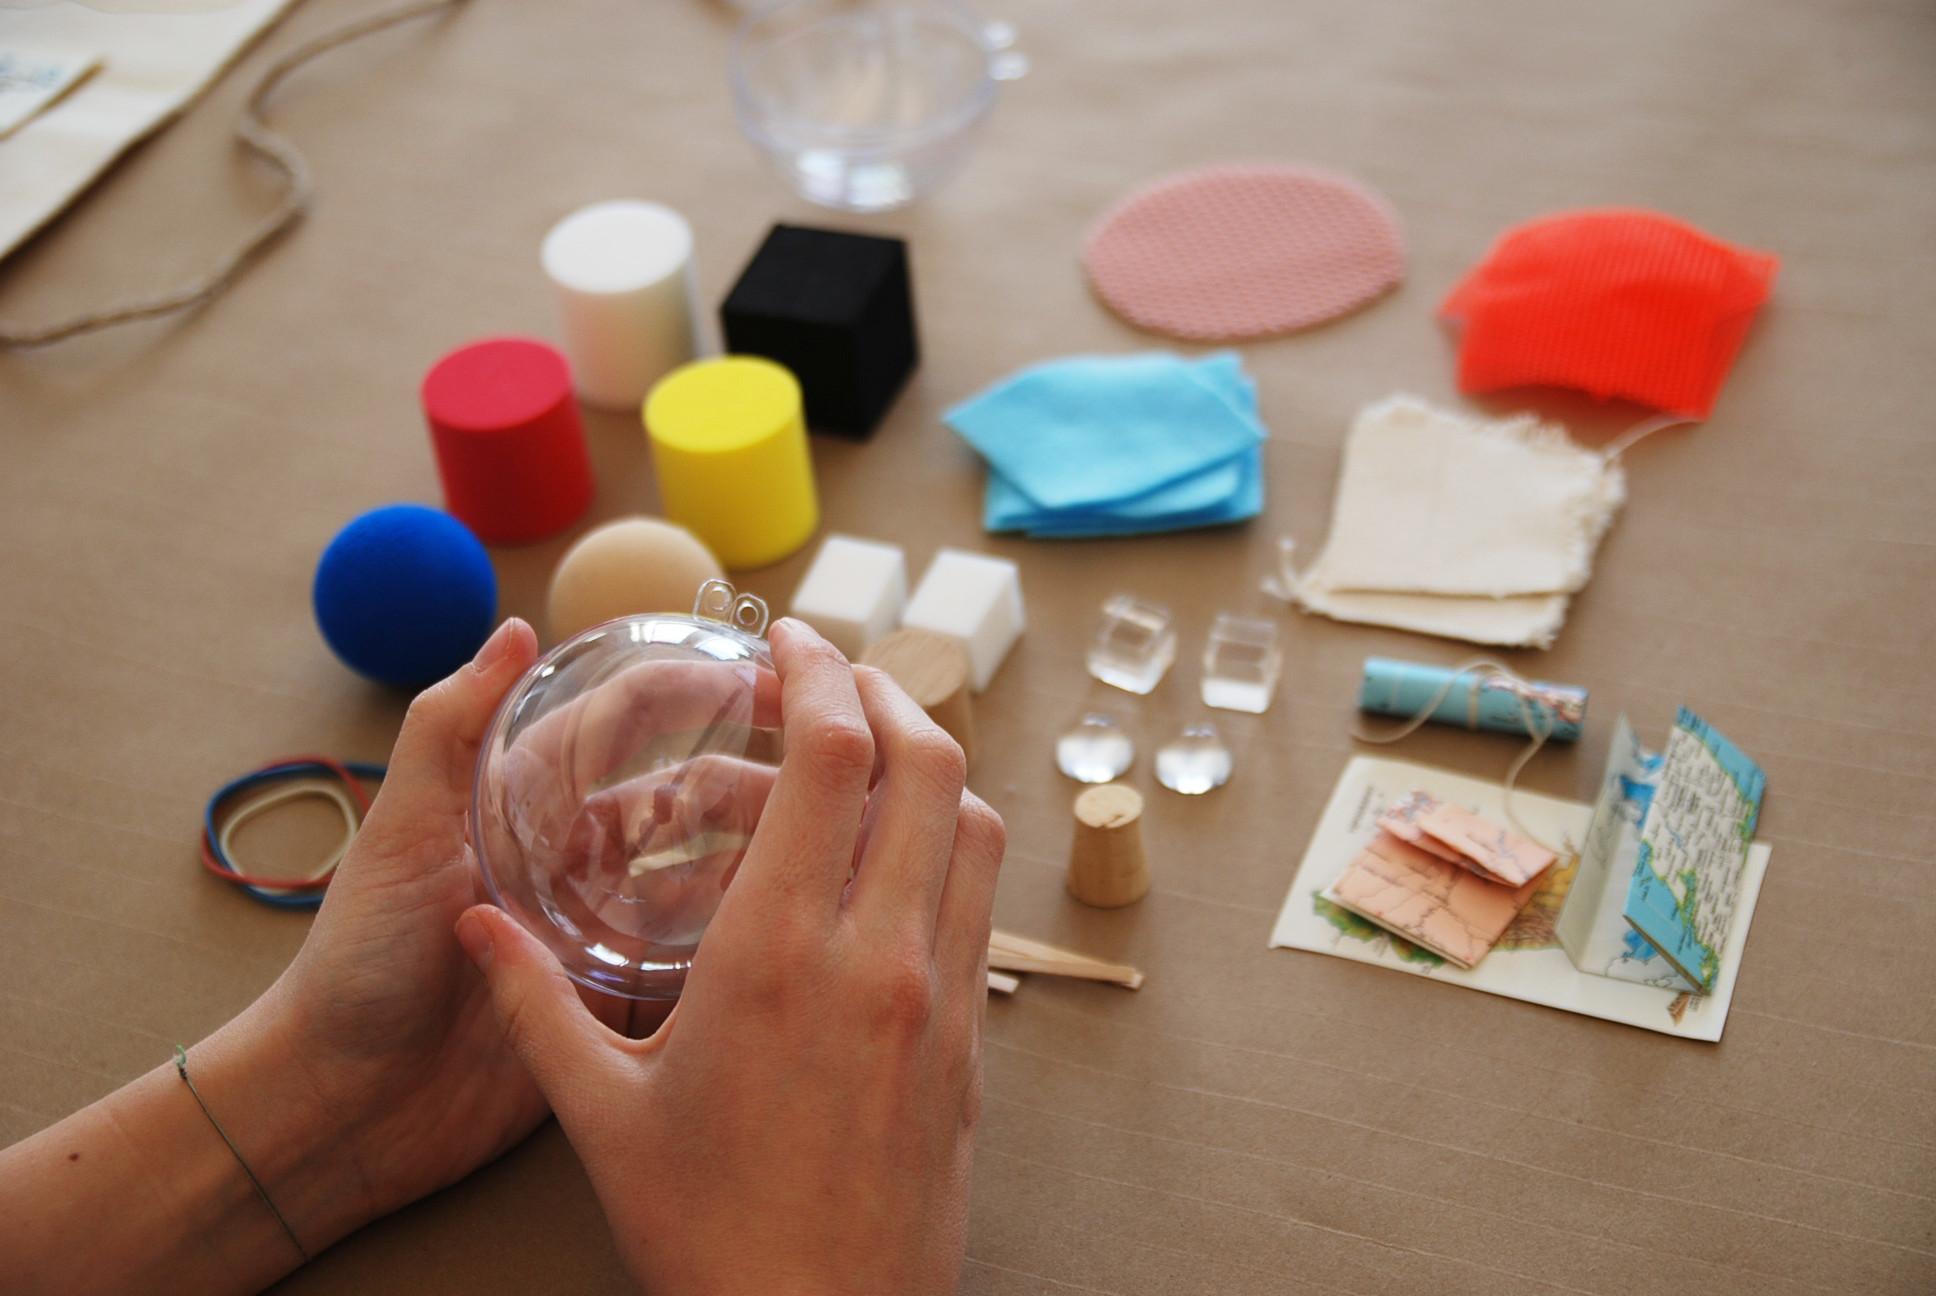 Visual Art & Prototyping